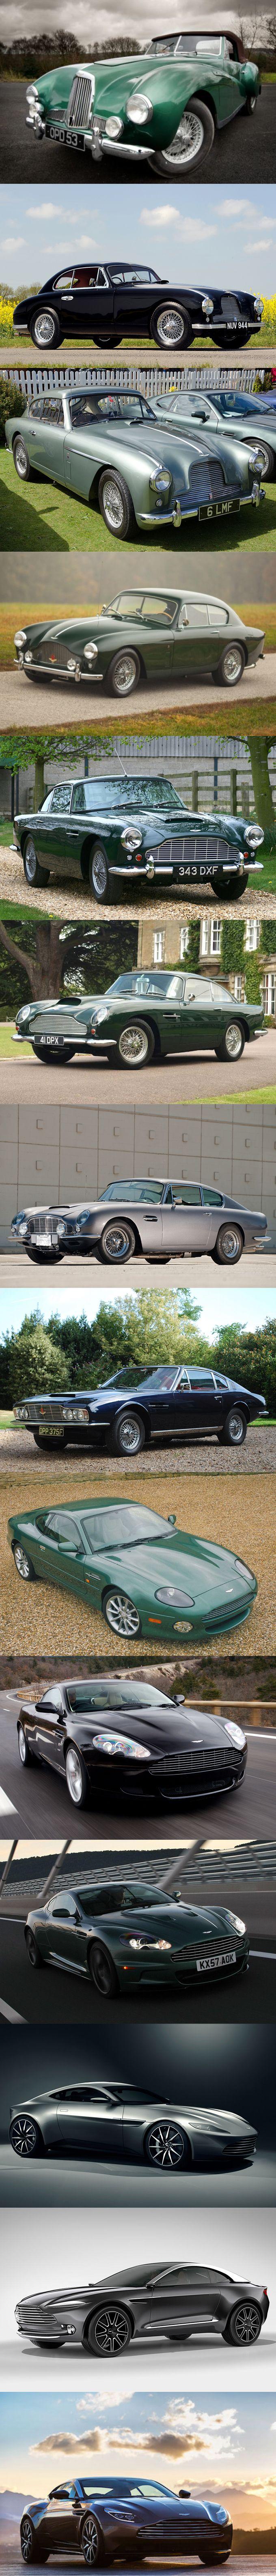 Aston Martin DB / 1948 DB1 / 1950 DB2 / 1953 DB2/4 / 1957 DB Mark III / 1958 DB4 / 1963 DB5 / 1965 DB6 / 1967 DBS / 1994 DB7 / 2004 DB9 / 2007 DBS / 2014 DB10 concept / 2015 DBX concept / 2016 DB11 / UK / green blue black silver